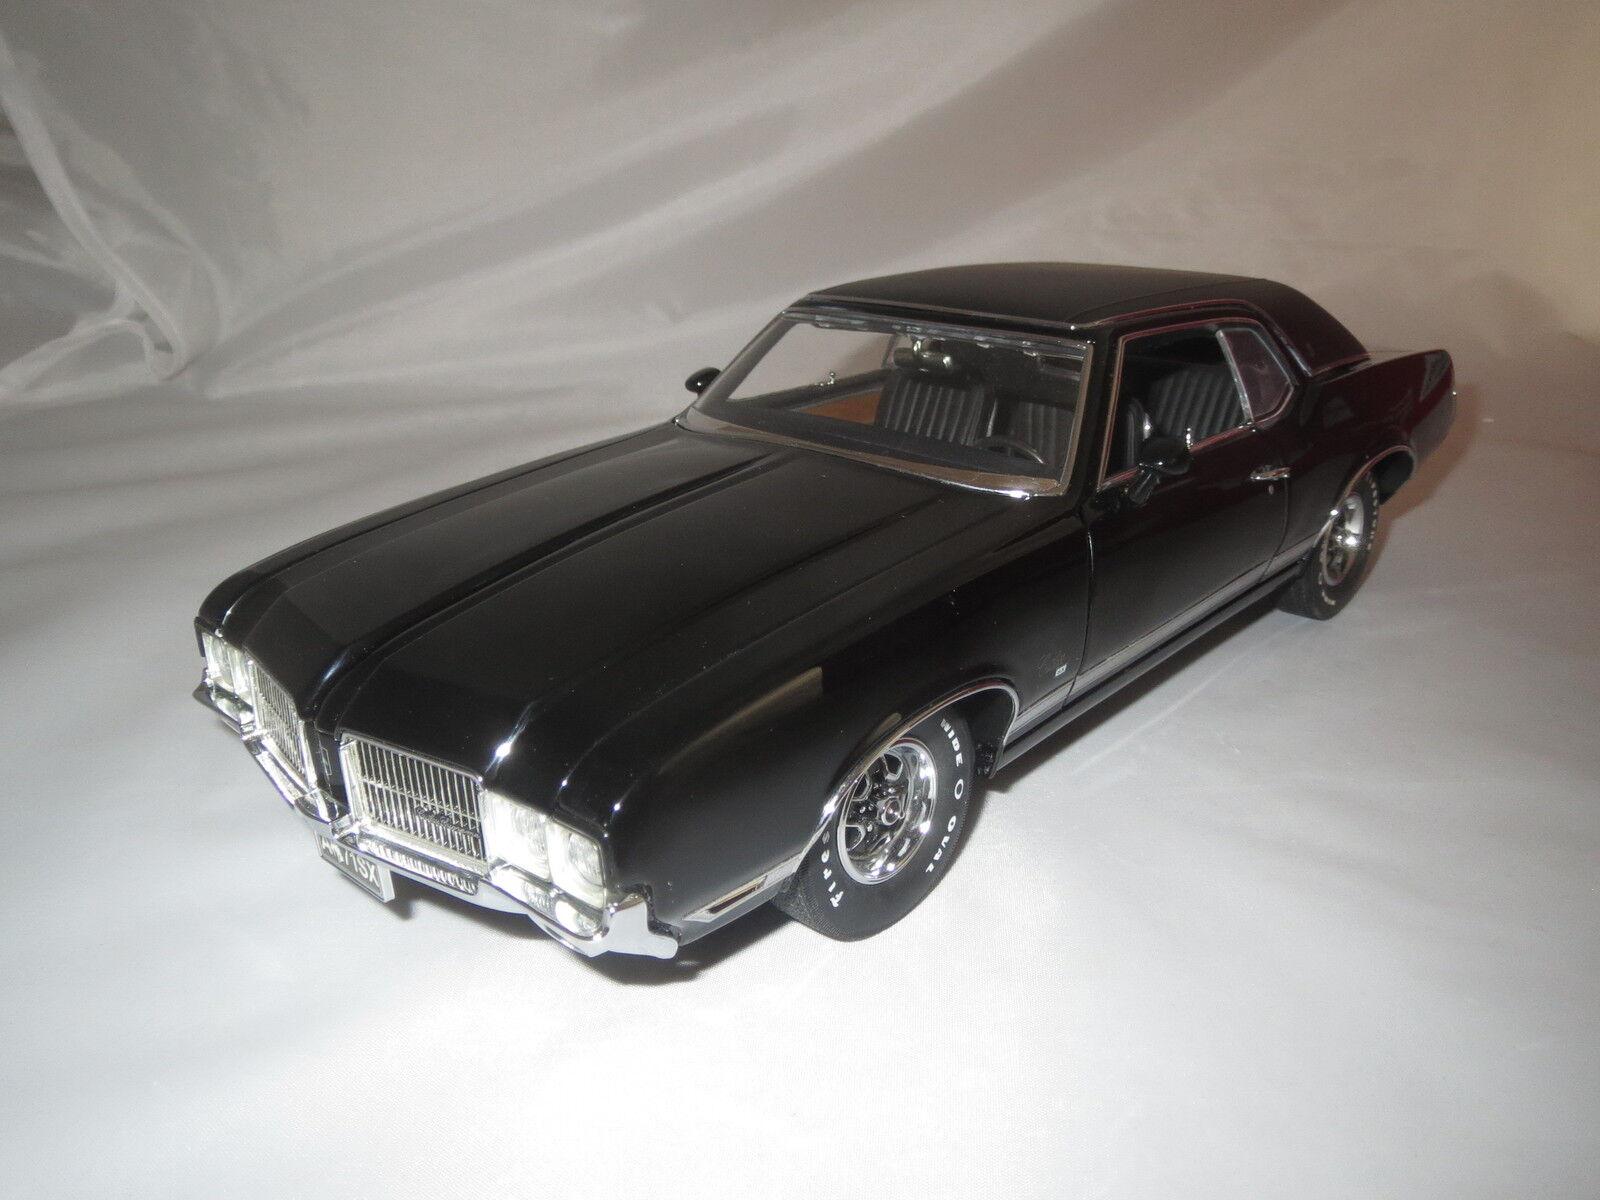 Lane EXACTDETAIL replicas  71 Oldsmobile Cutlass supreme sx Noir 1 18 OVP